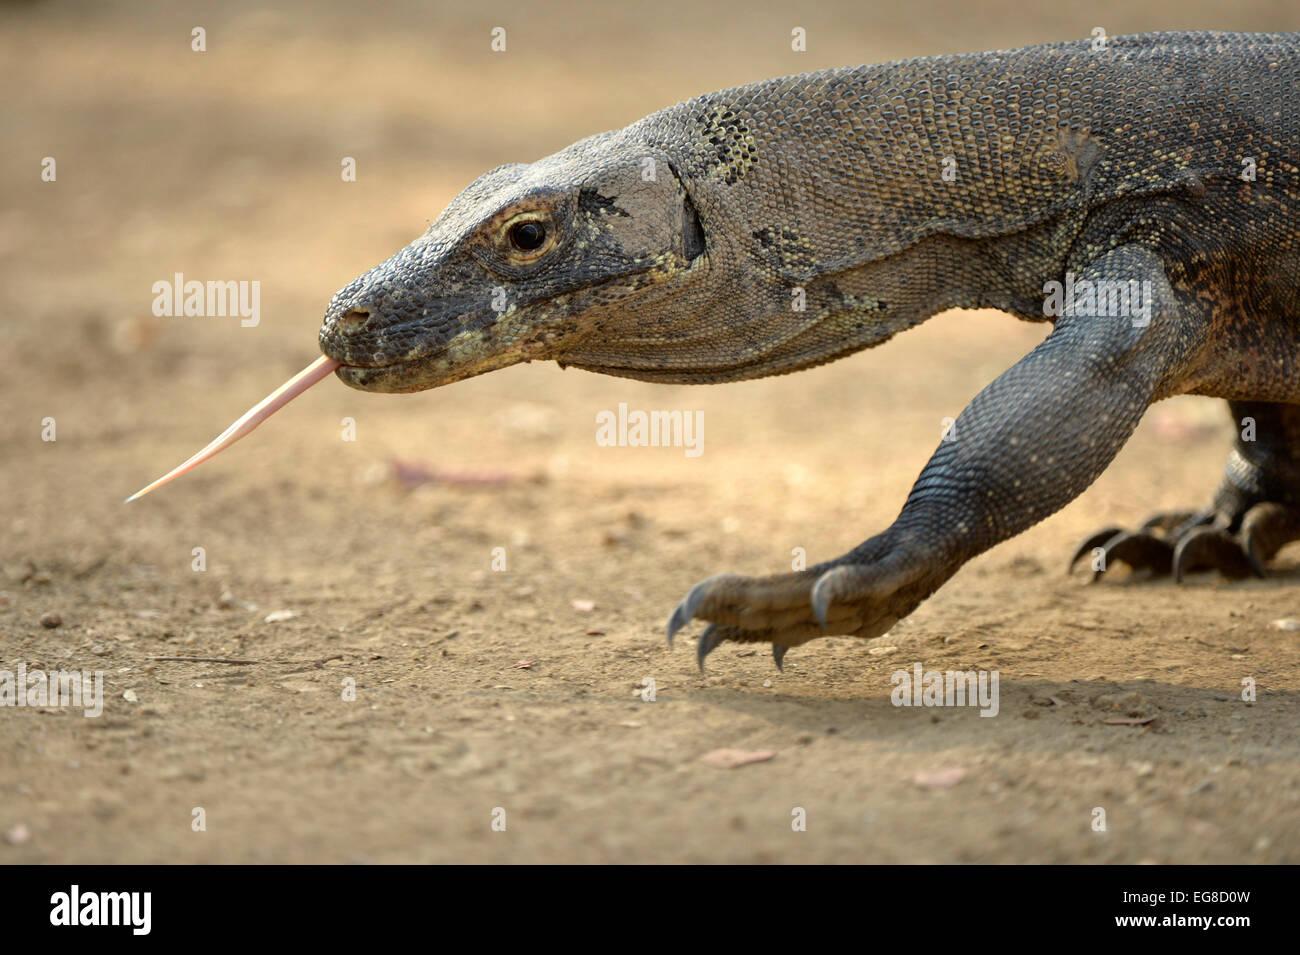 Komodo Dragon (Varanus komodoensis) walking with tongue extended, Komodo Island, Indonesia, October - Stock Image